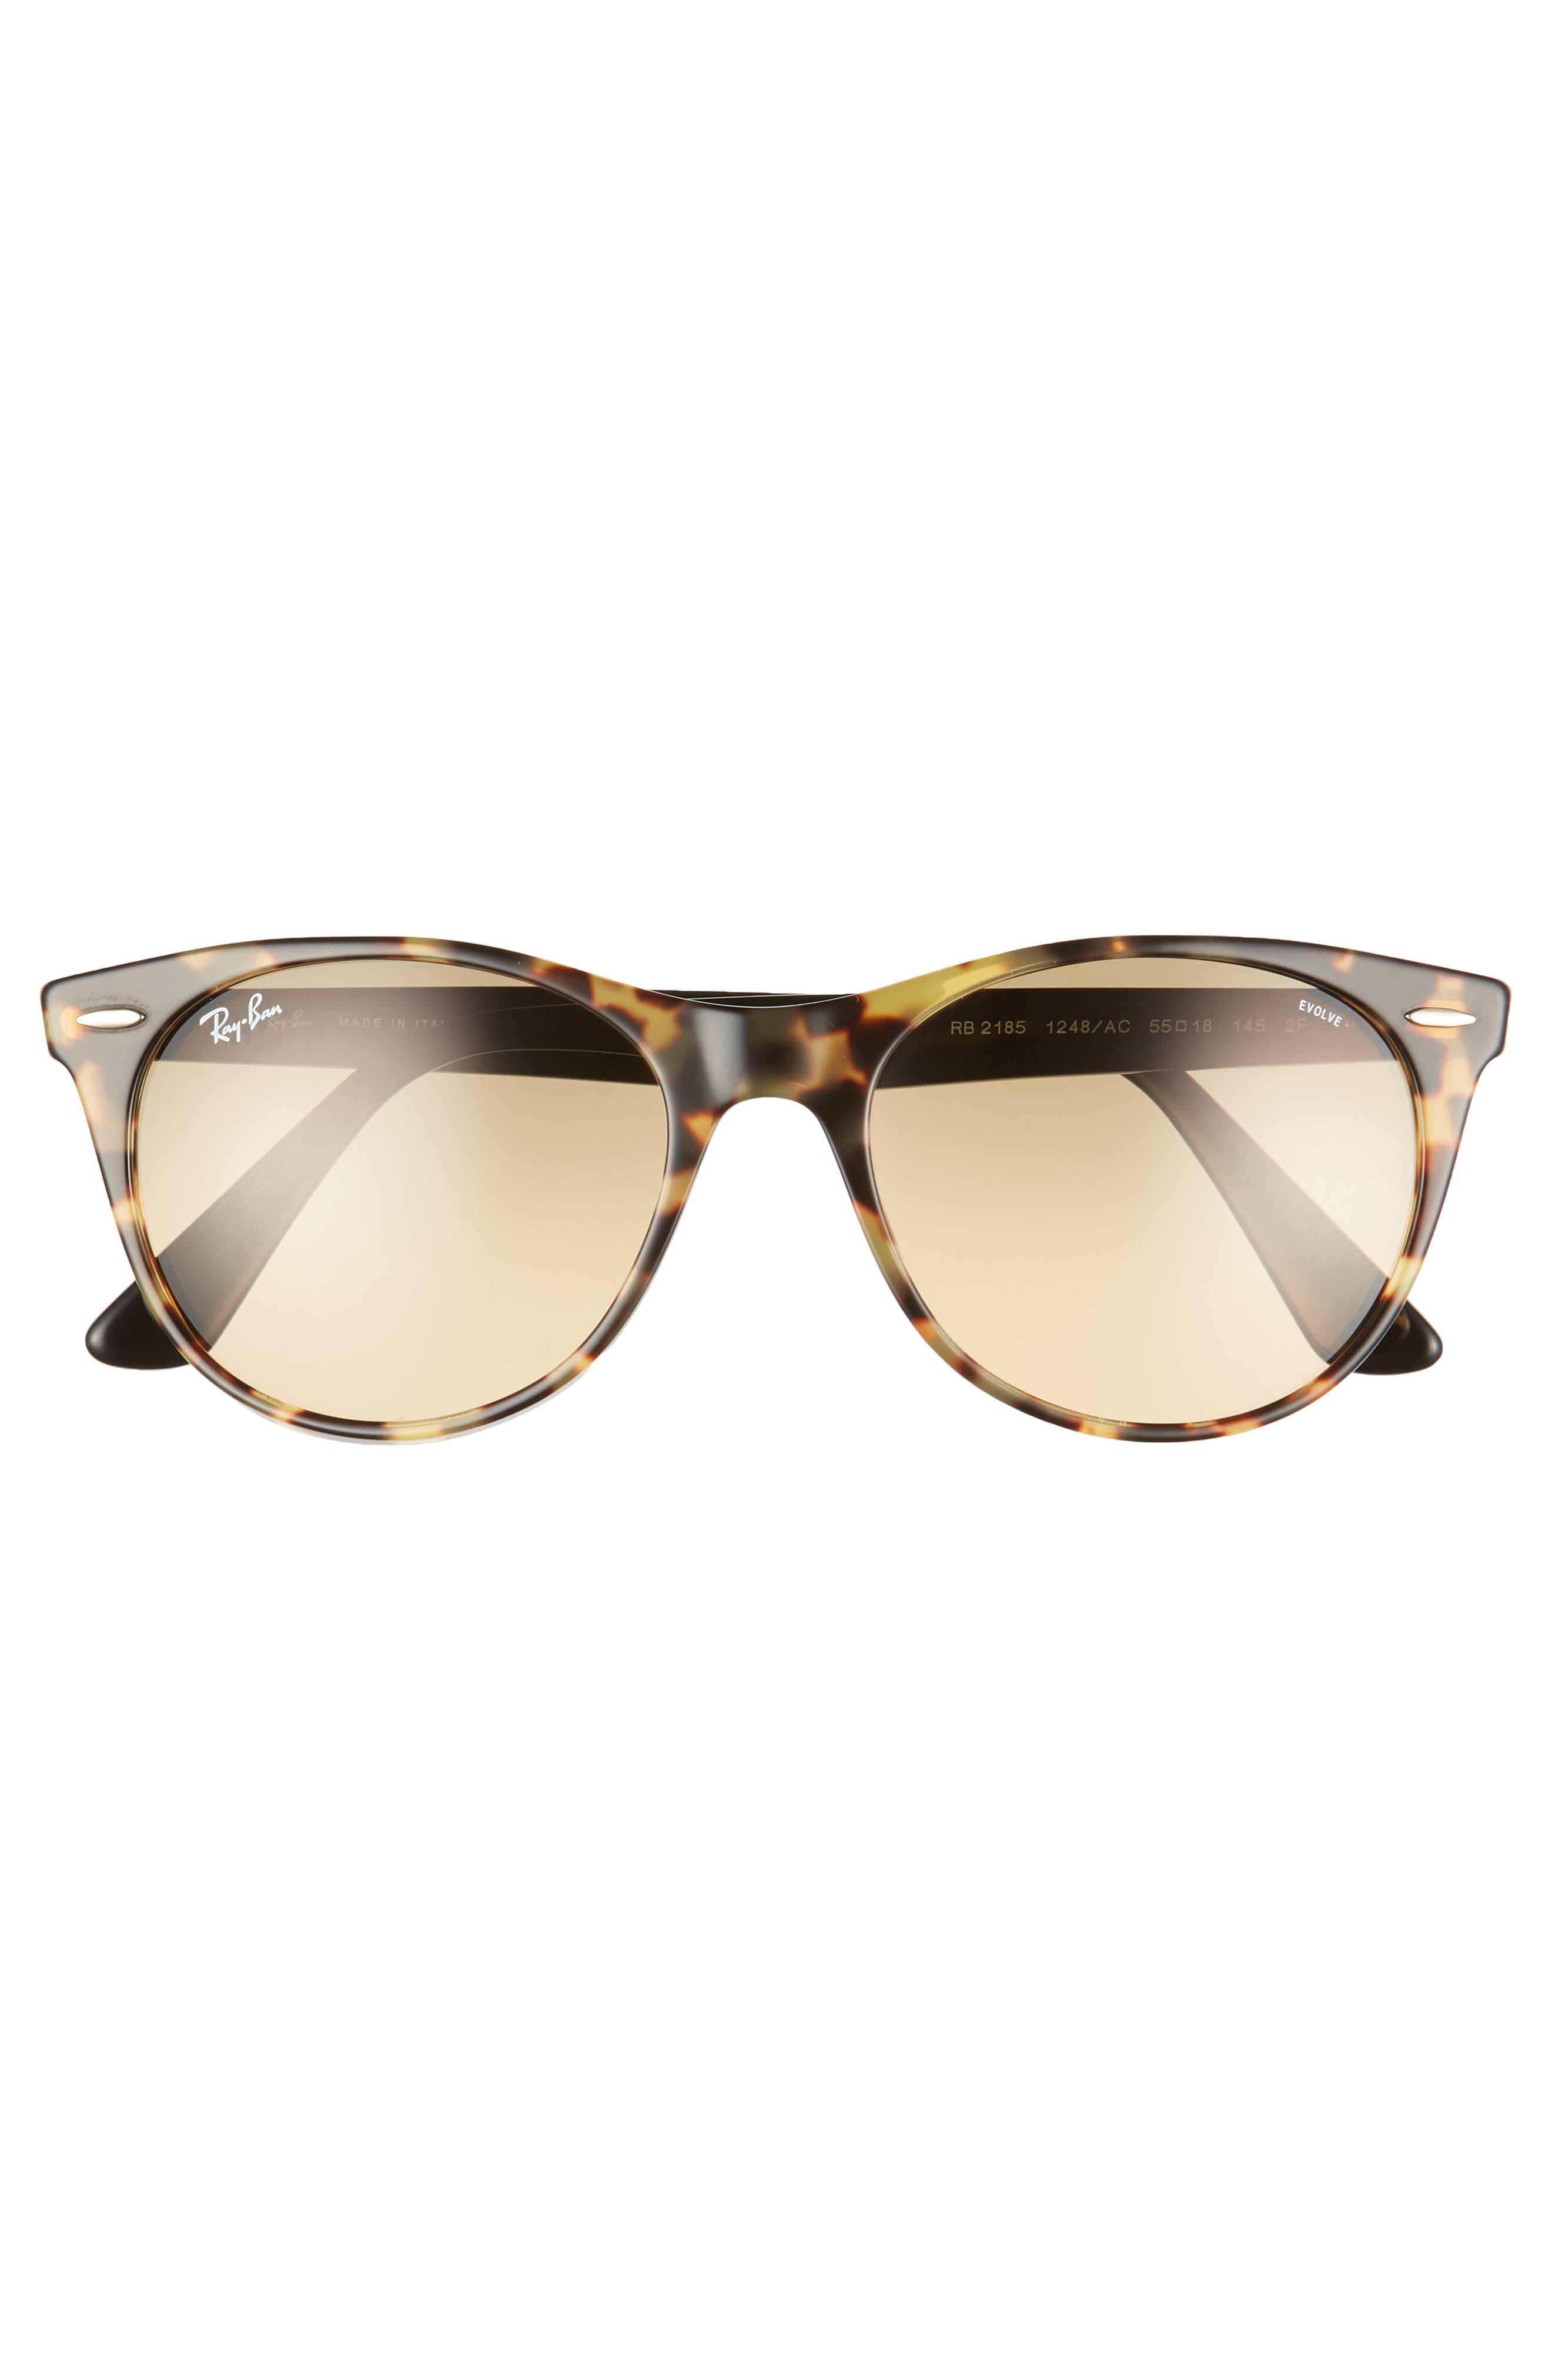 RAY-BAN, Wayfarer II 55mm Polarized Photochromic Sunglasses, Alternate thumbnail 2, color, 200